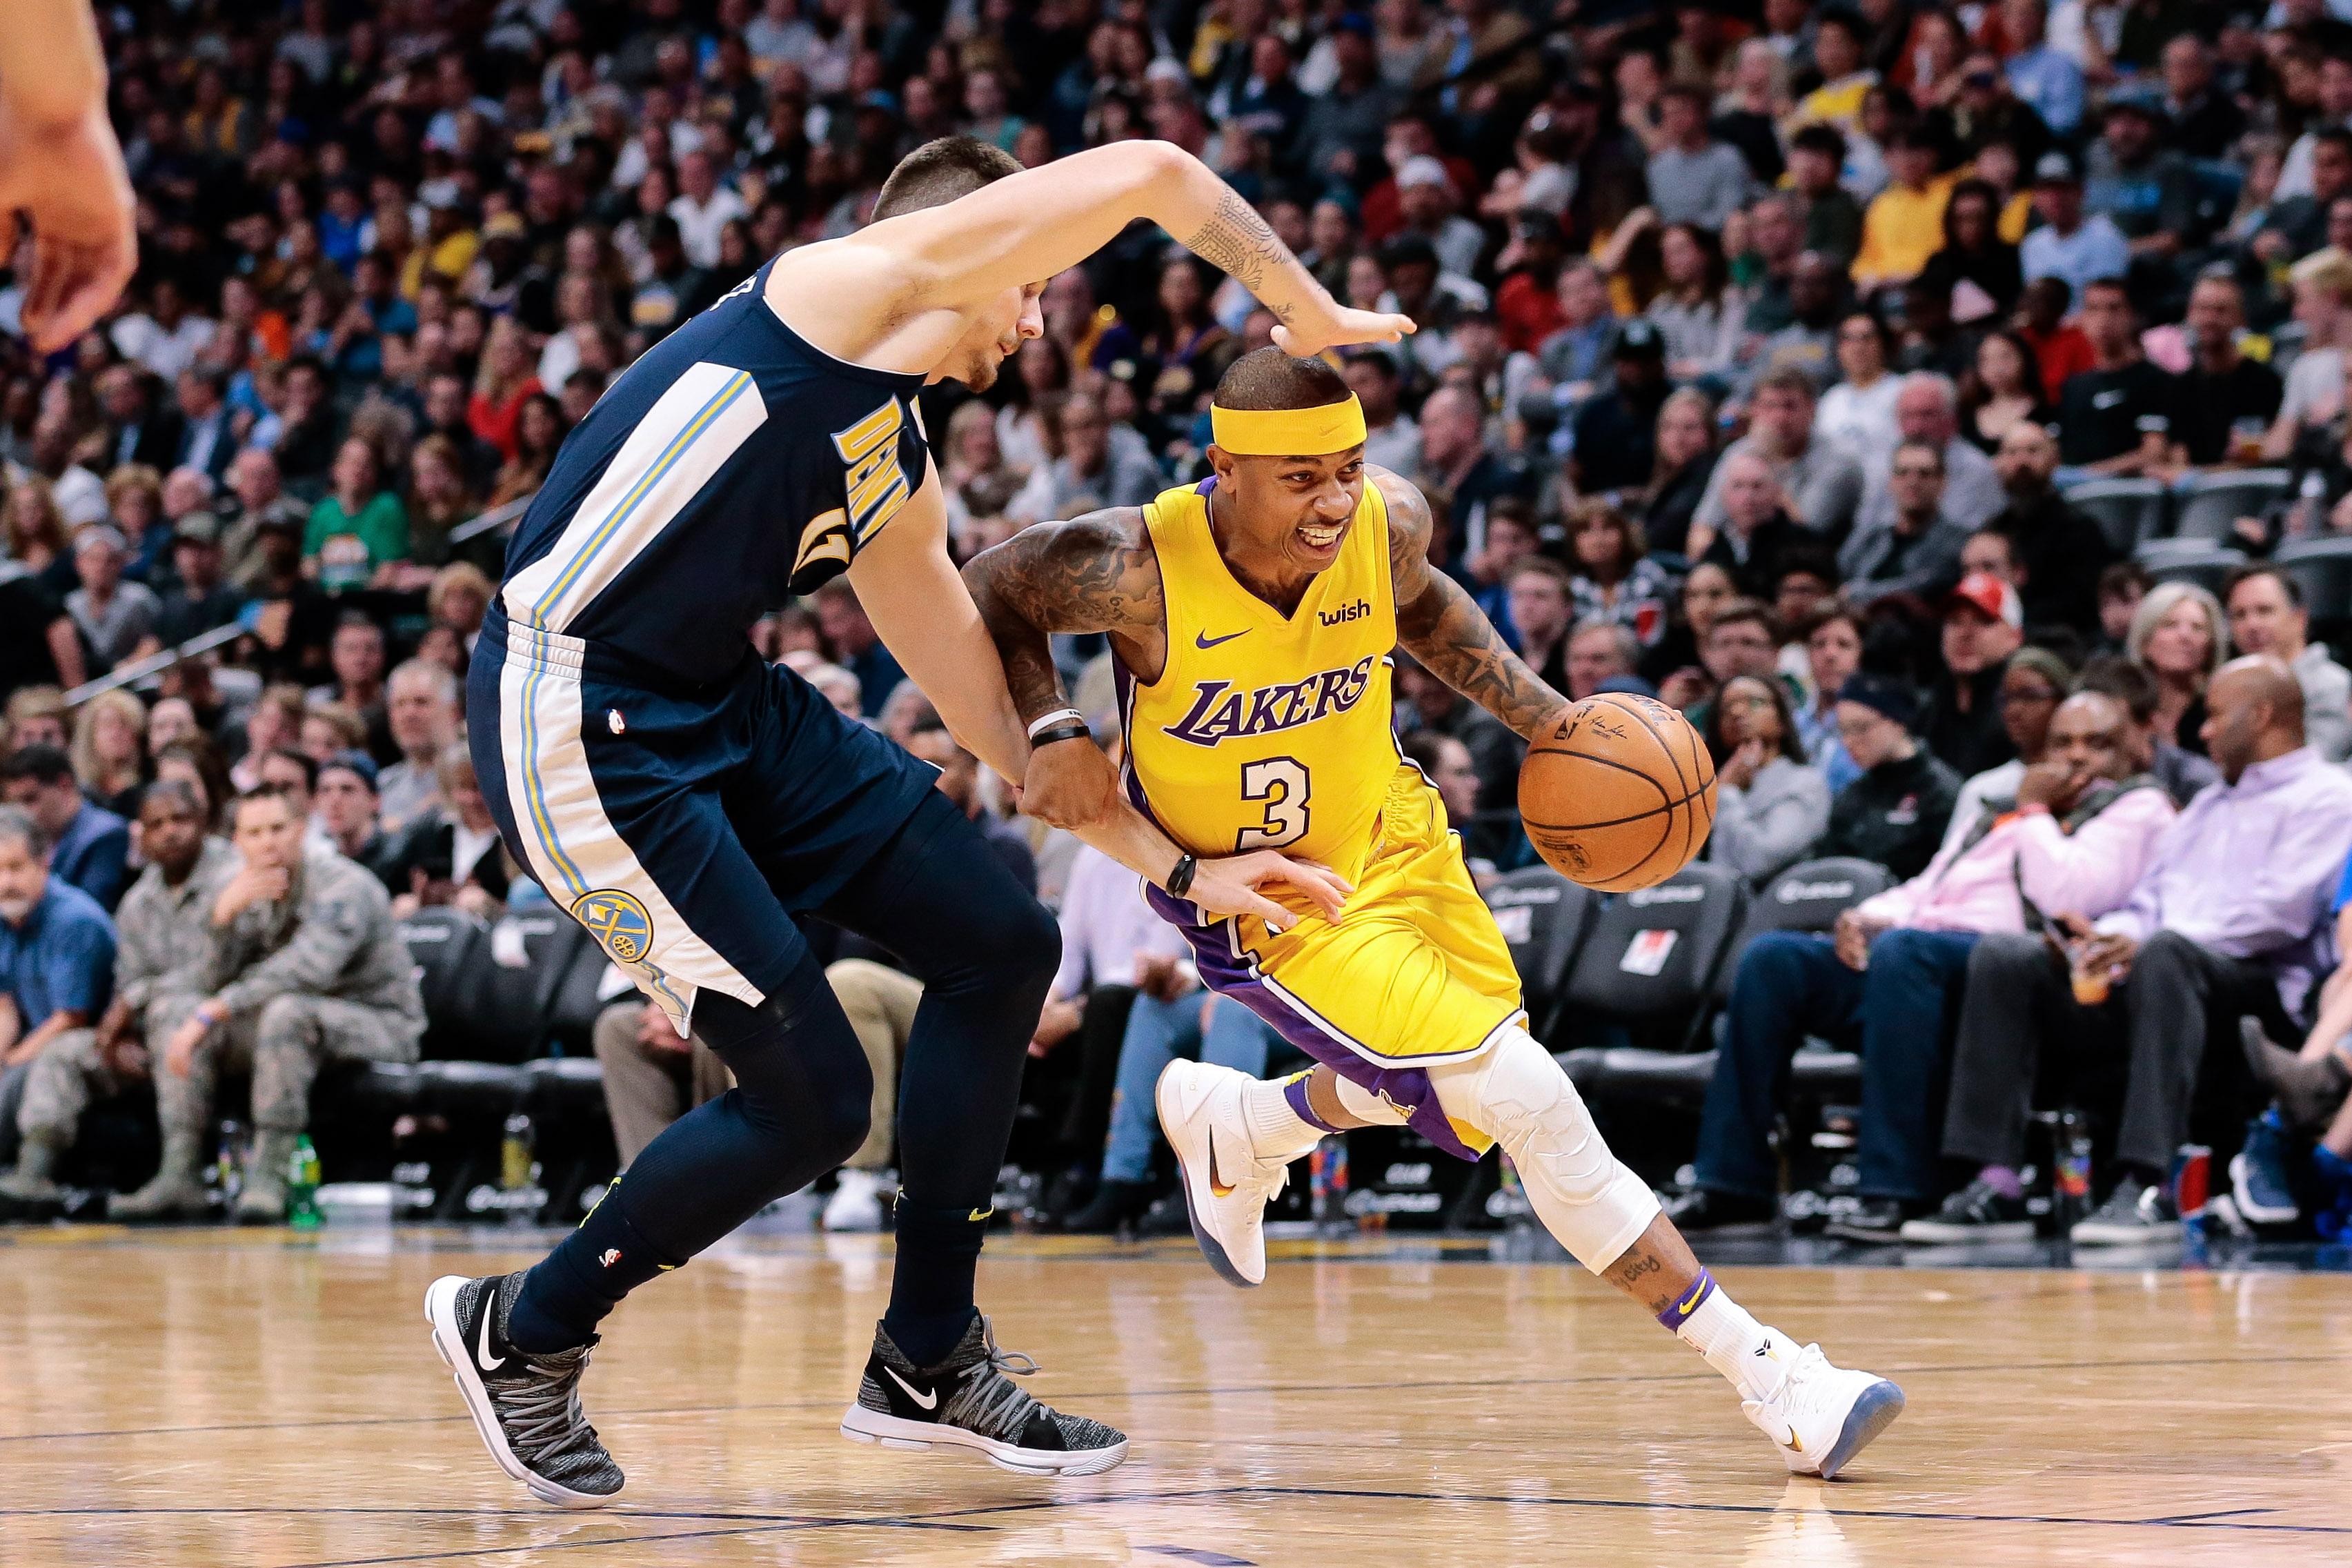 Denver Nuggets forward Juancho Hernangomez (41) guards Los Angeles Lakers guard Isaiah Thomas (3) in the third quarter at the Pepsi Center.